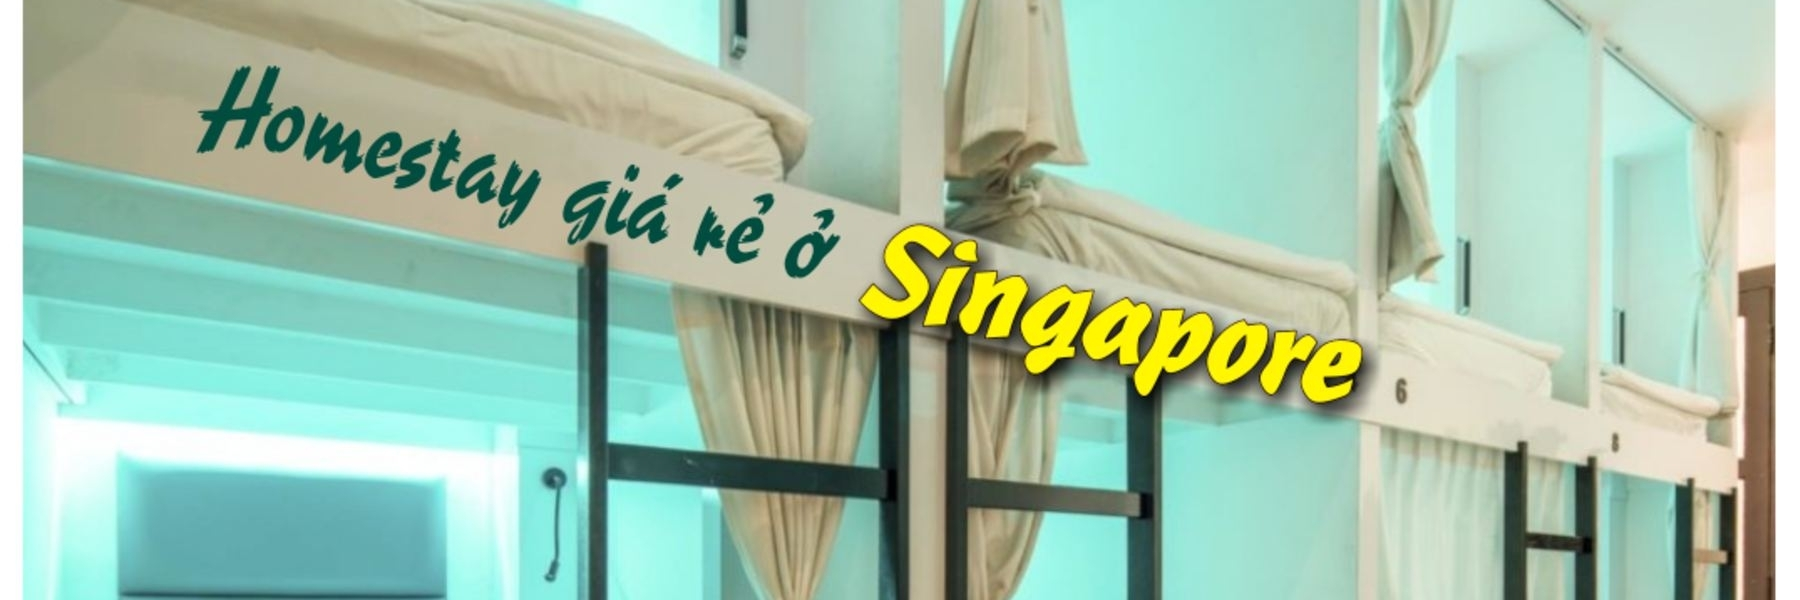 https://gody.vn/blog/lifeandgostudio4271/post/o-hostel-homestay-gia-re-bi-kip-tiet-kiem-chi-phi-cho-chuyen-du-lich-singapore-tu-tuc-4564